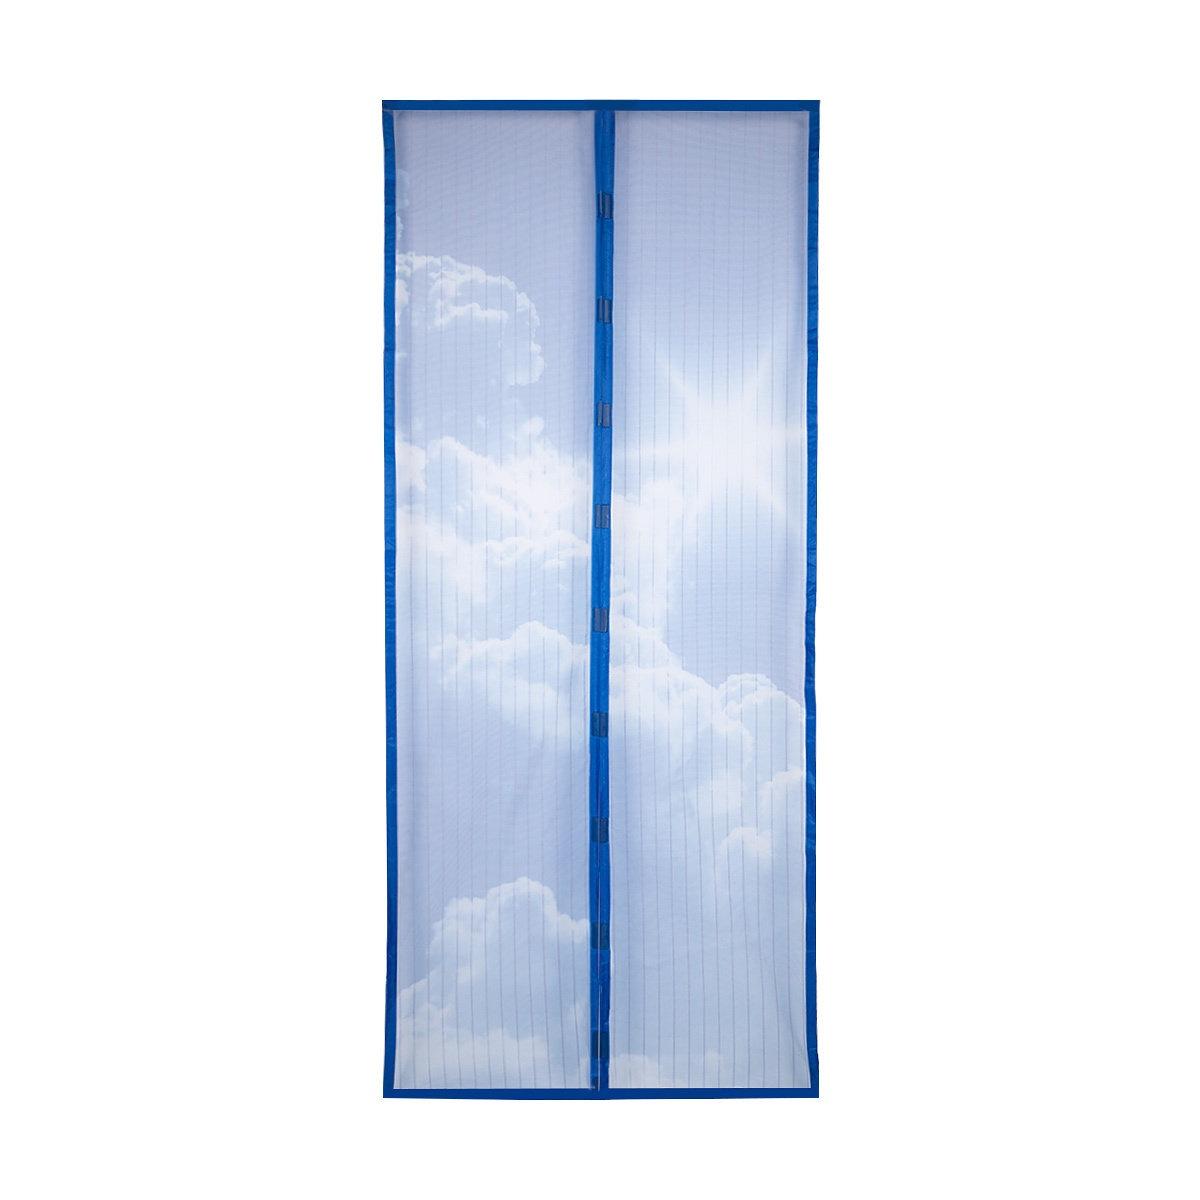 Фото - Сетка антимоскитная MARKETHOT Сетка москитная на дверь на магнитах, цвет синий, синий антимоскитная сетка afa подъемник складной